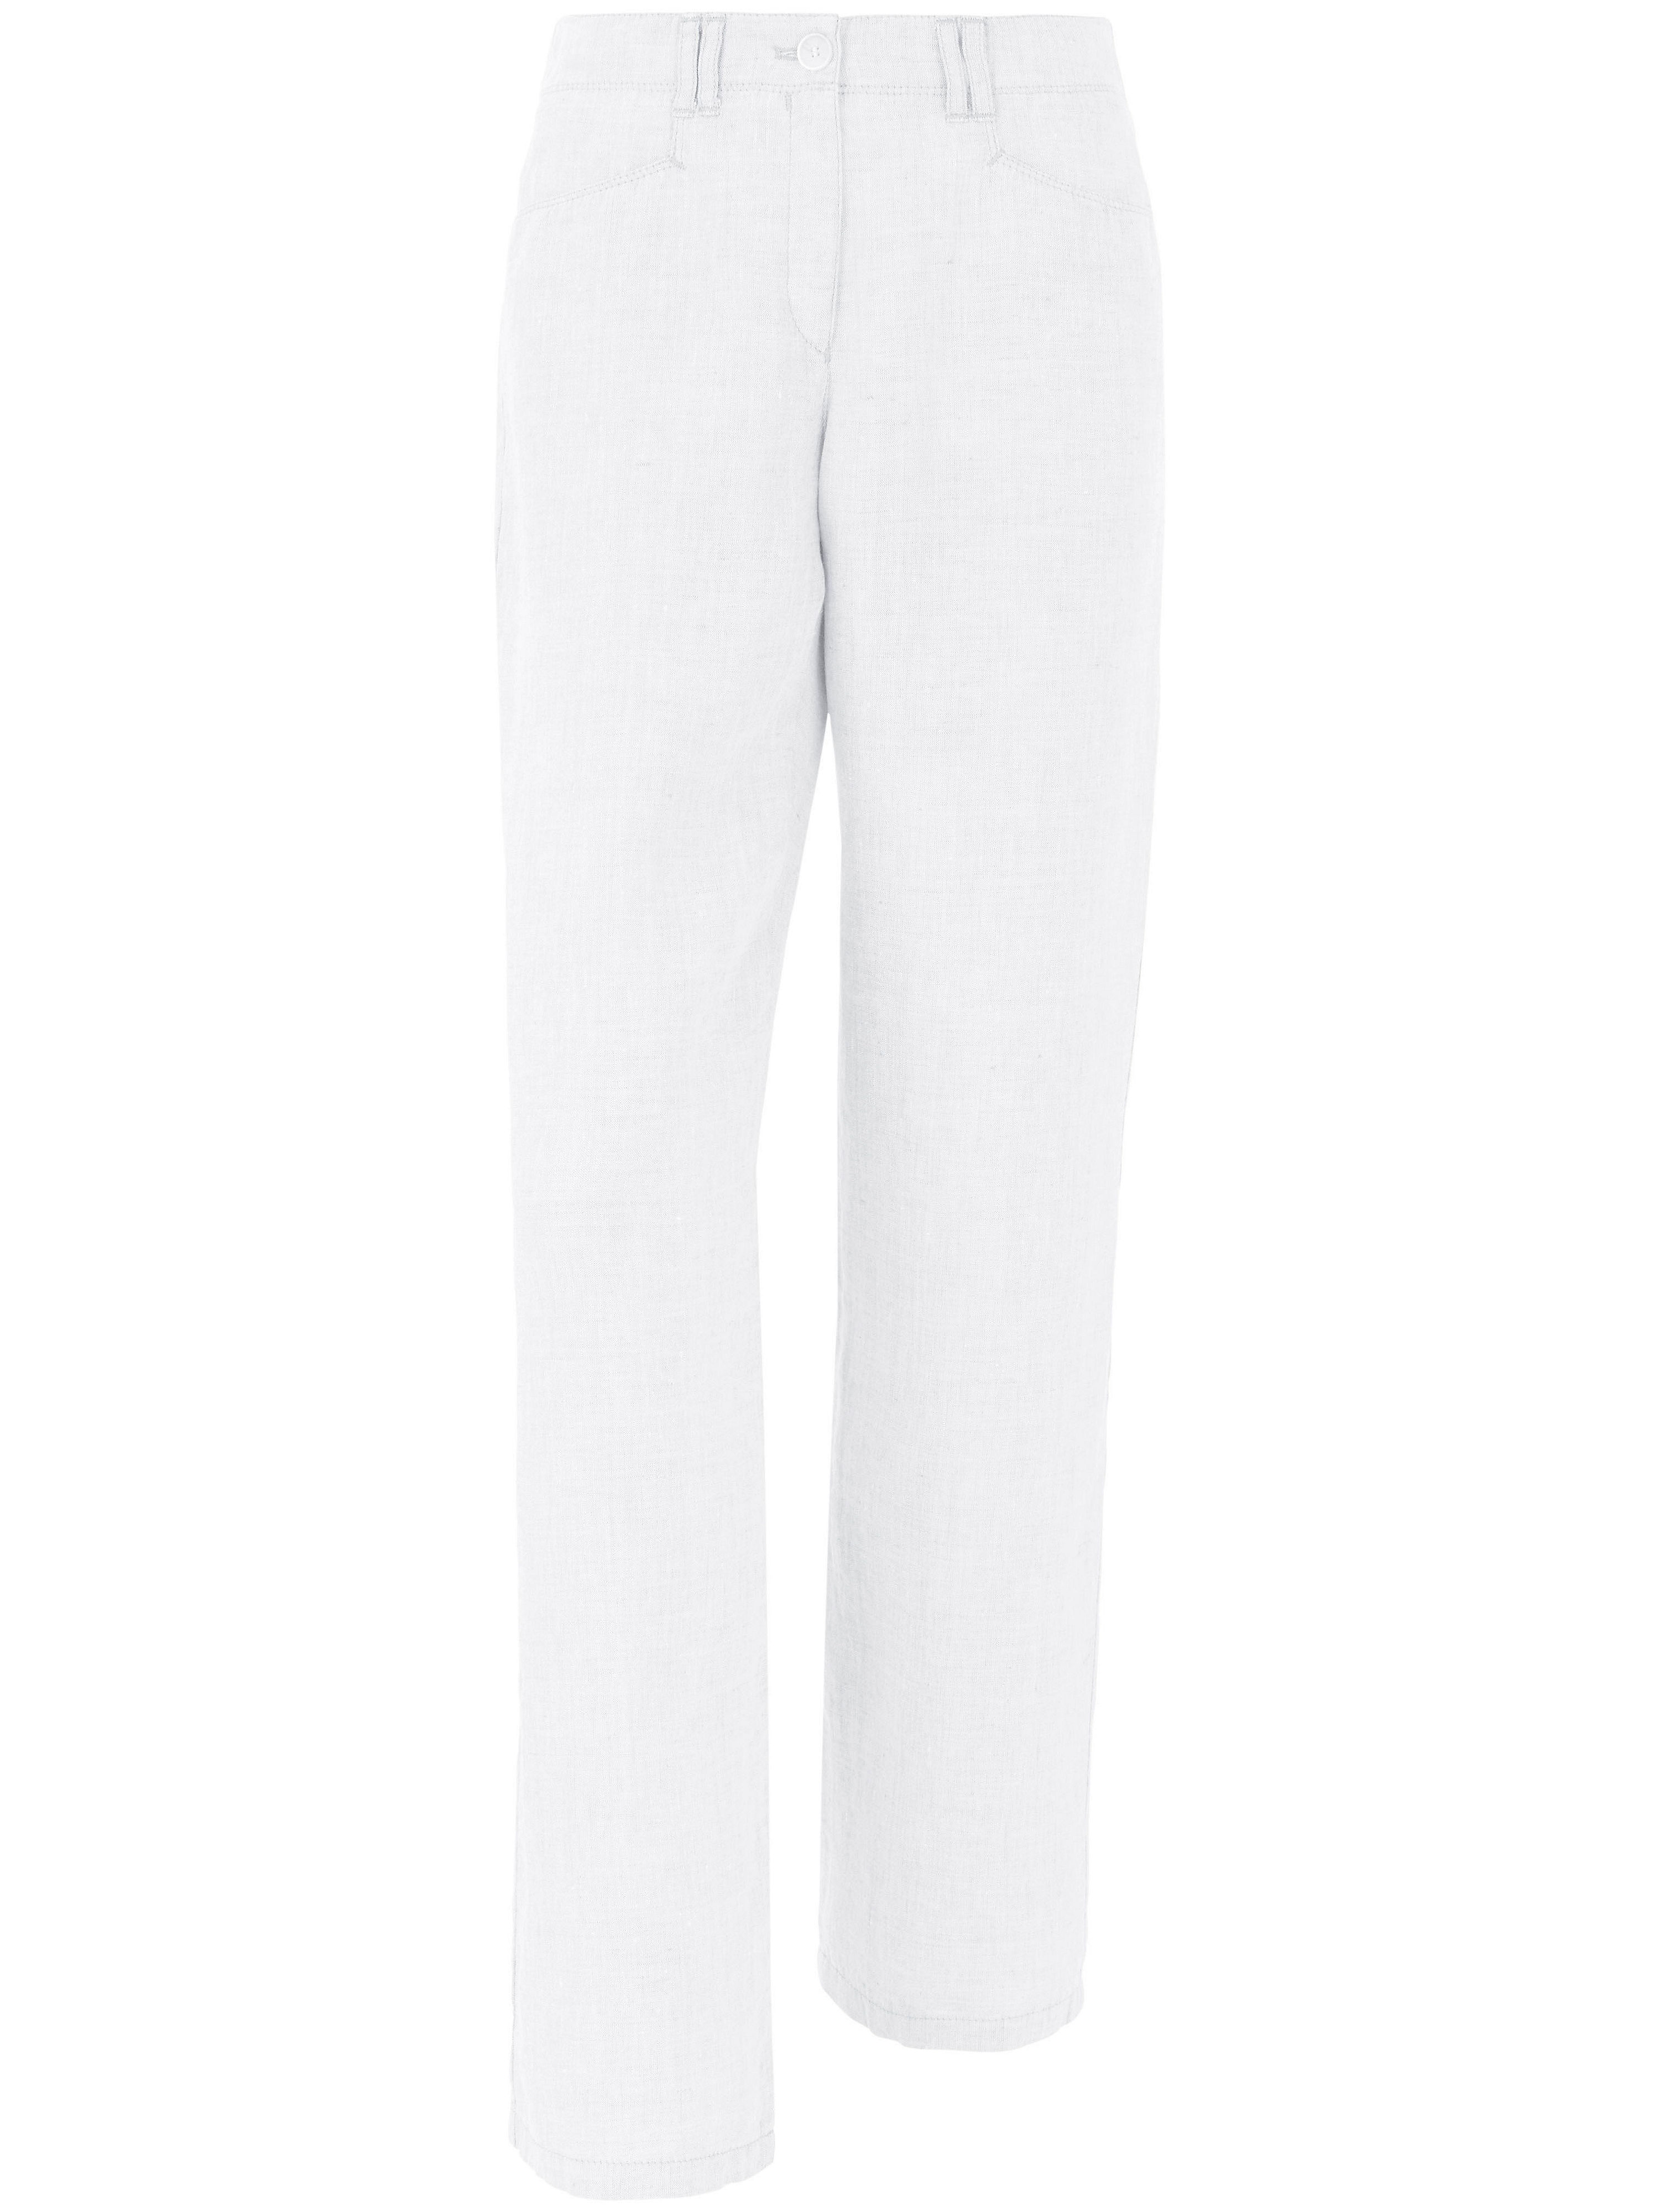 Le pantalon pur lin Brax Feel Good blanc taille 23